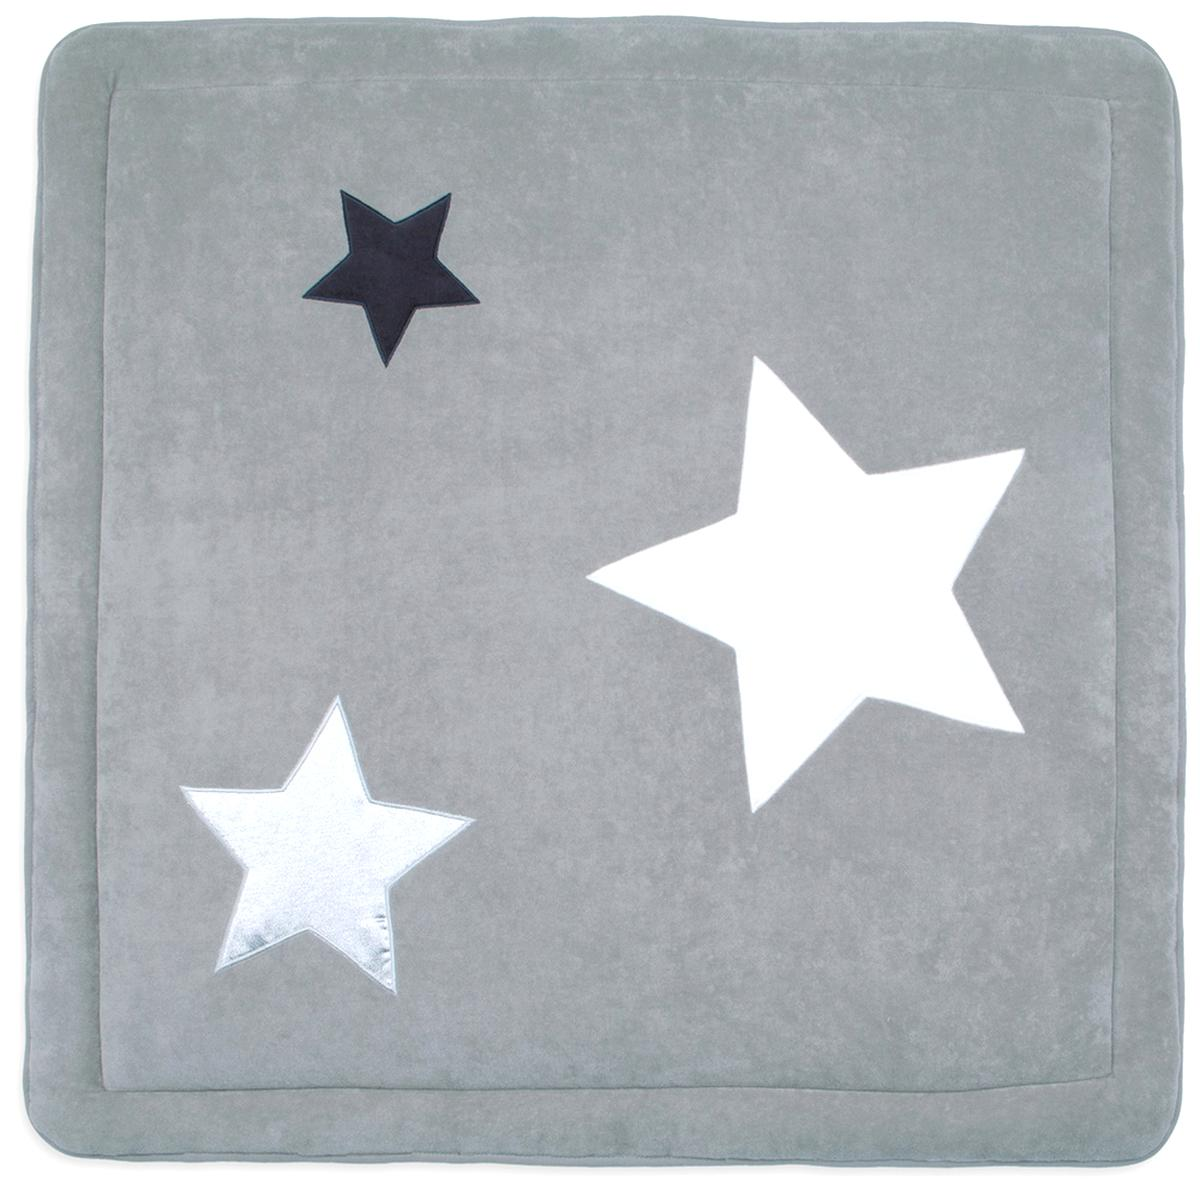 100x100 gris avec etoile swaddyl tapis